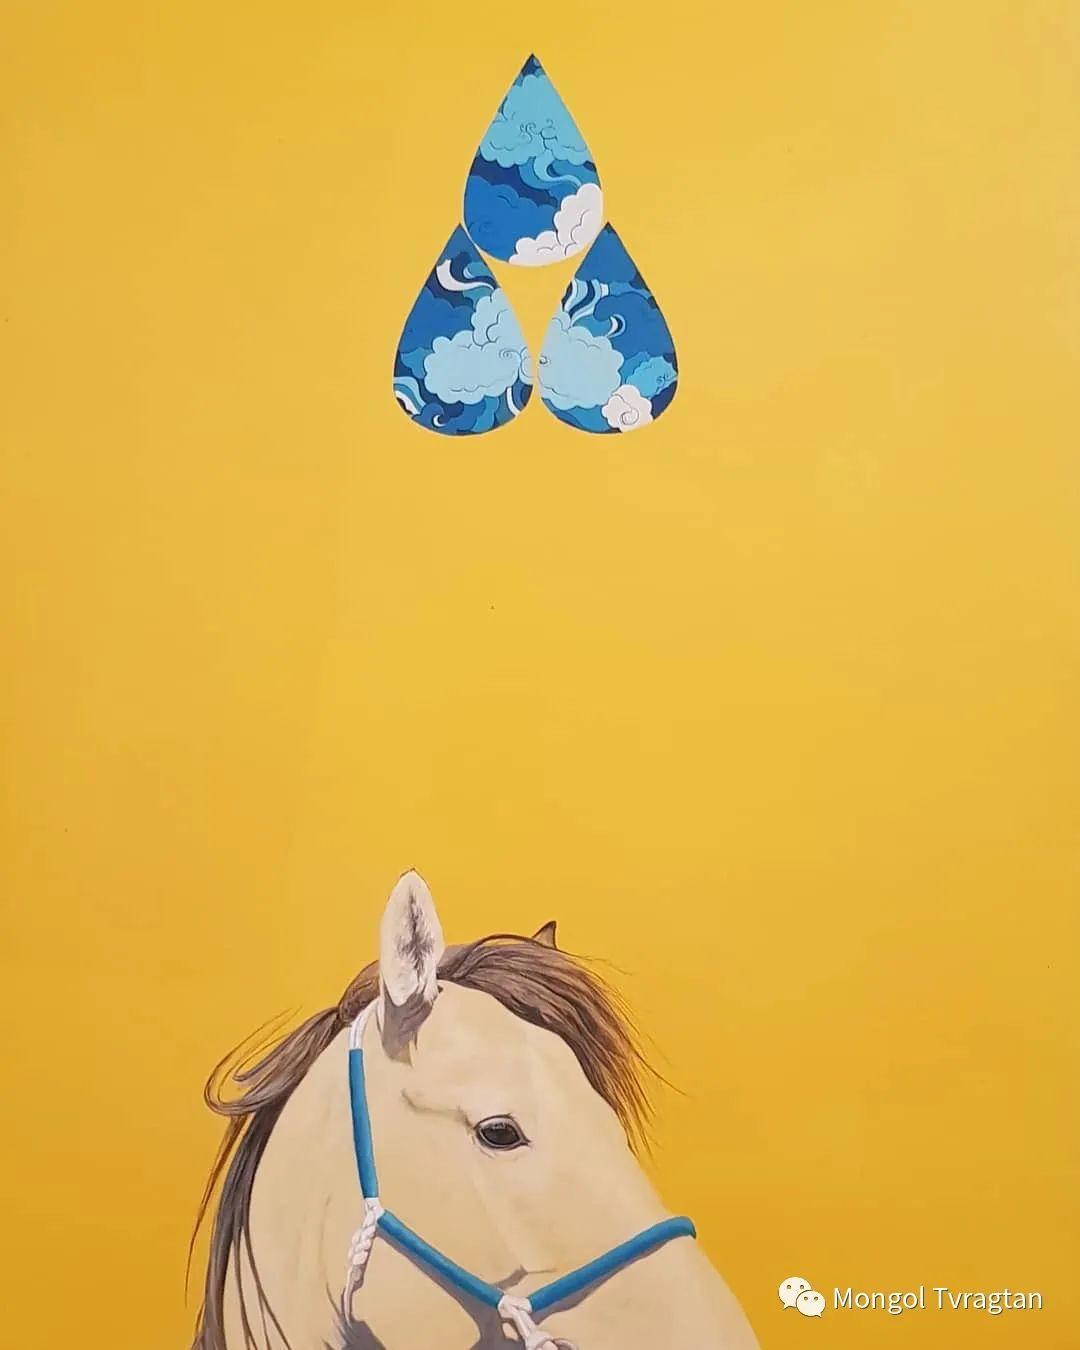 ᠤᠷᠠᠨ ᠵᠢᠷᠤᠭ- ᠪ᠂ ᠬᠡᠰᠢᠭᠰᠦ᠋ᠷᠦᠩ 第8张 ᠤᠷᠠᠨ ᠵᠢᠷᠤᠭ- ᠪ᠂ ᠬᠡᠰᠢᠭᠰᠦ᠋ᠷᠦᠩ 蒙古画廊